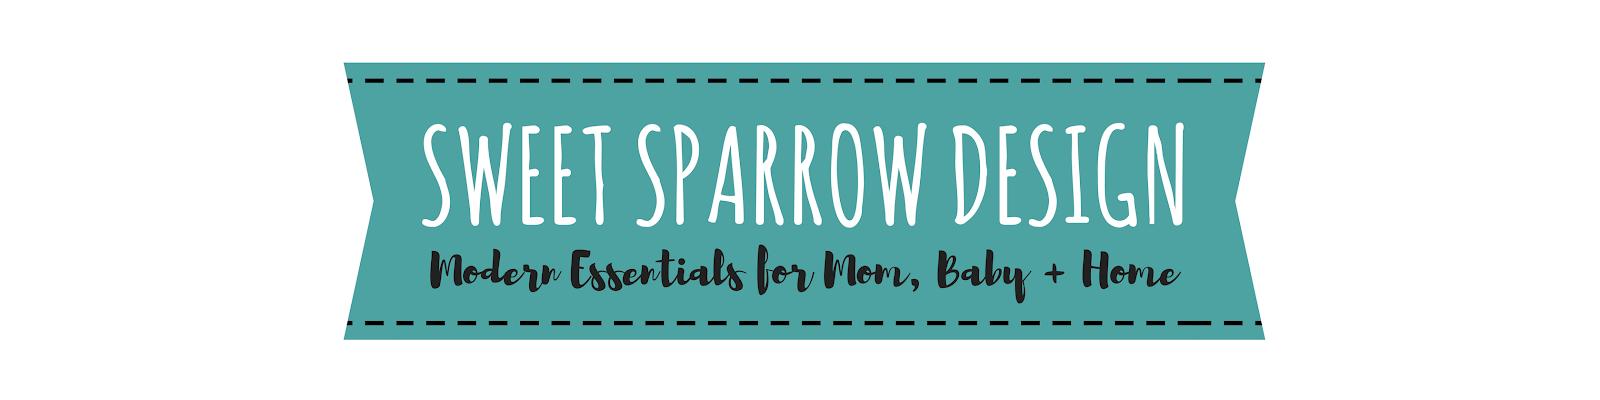 Sweet Sparrow Design